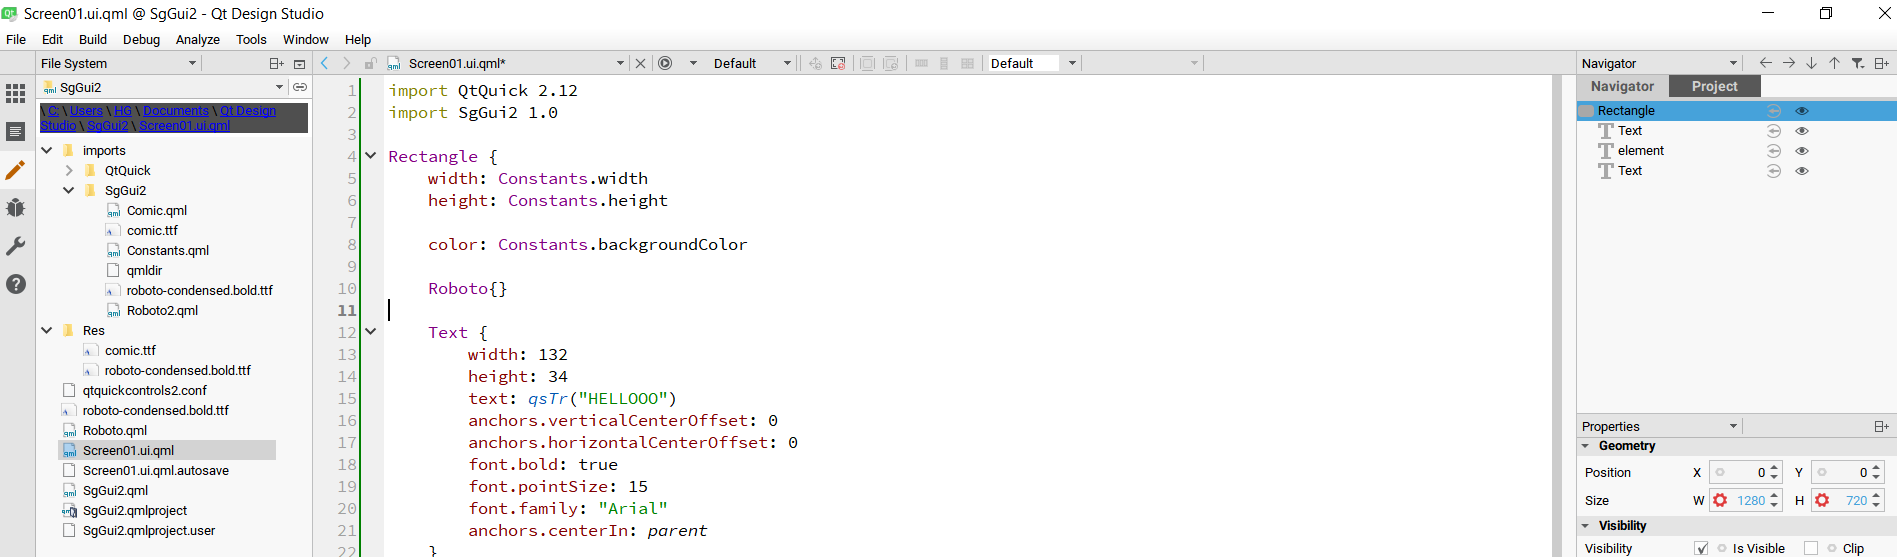 How to add font into Qt Design Studio 1 1 | Qt Forum